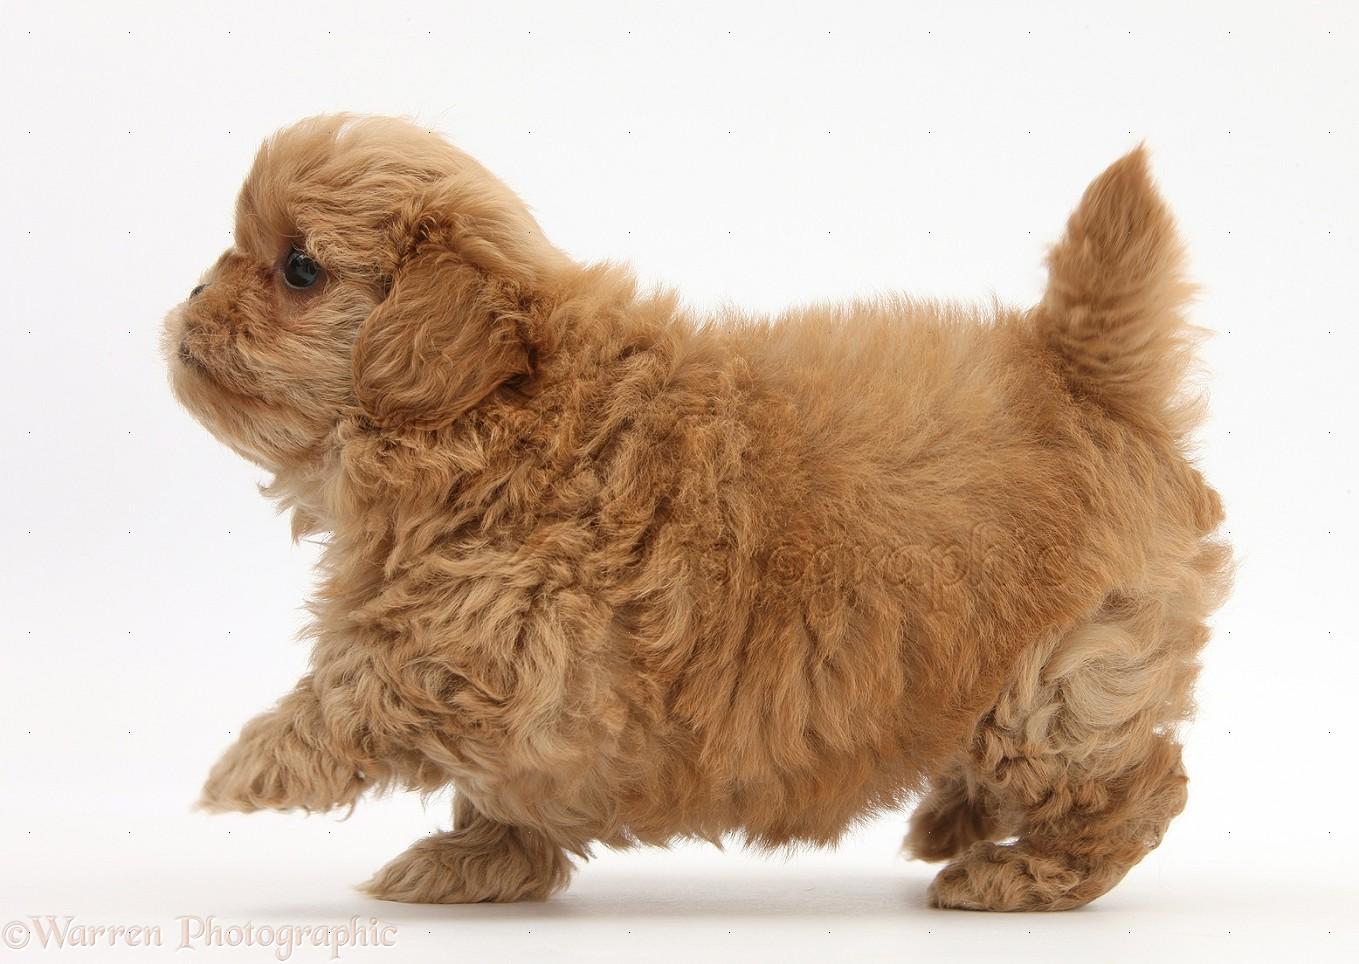 Wp25364 peekapoo pup 7 weeks old